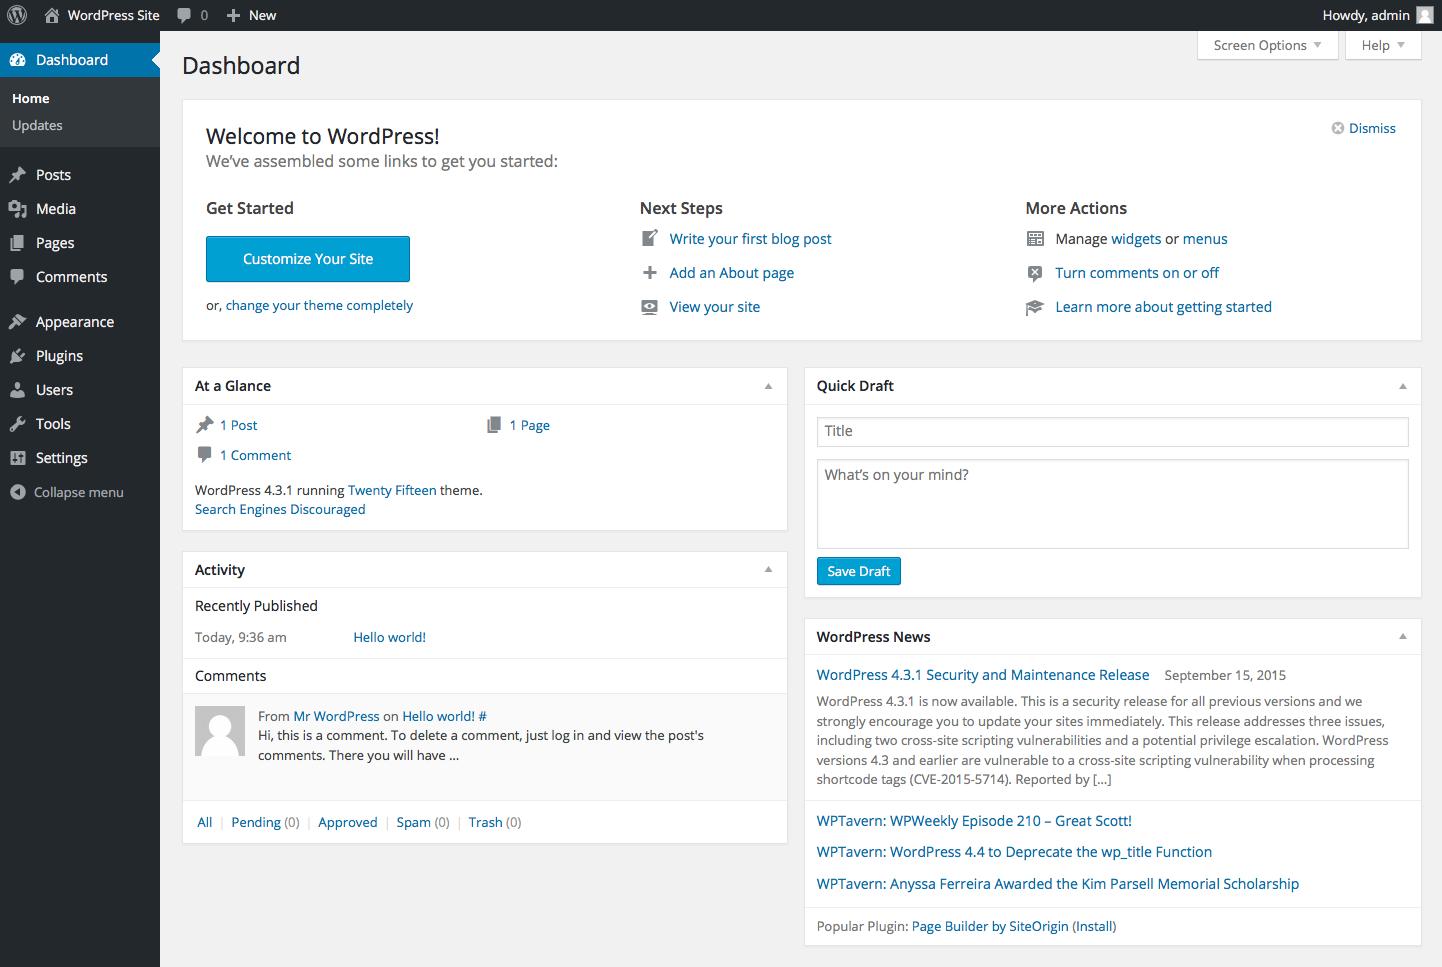 wordpress-site-dashboard